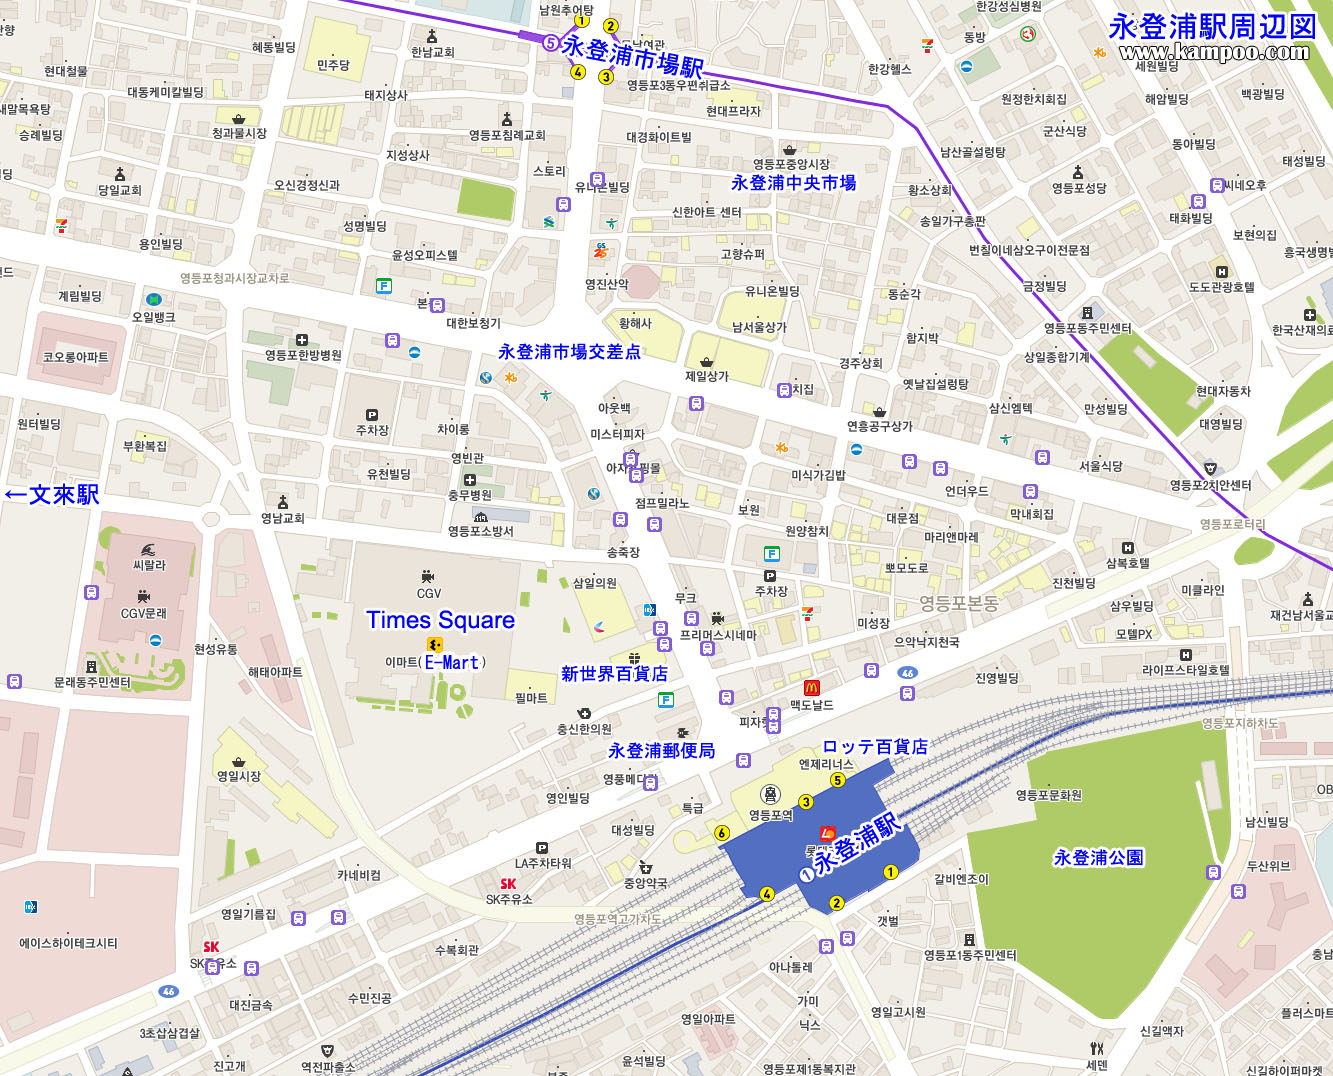 seoul_yeongdeungpo_map.jpg